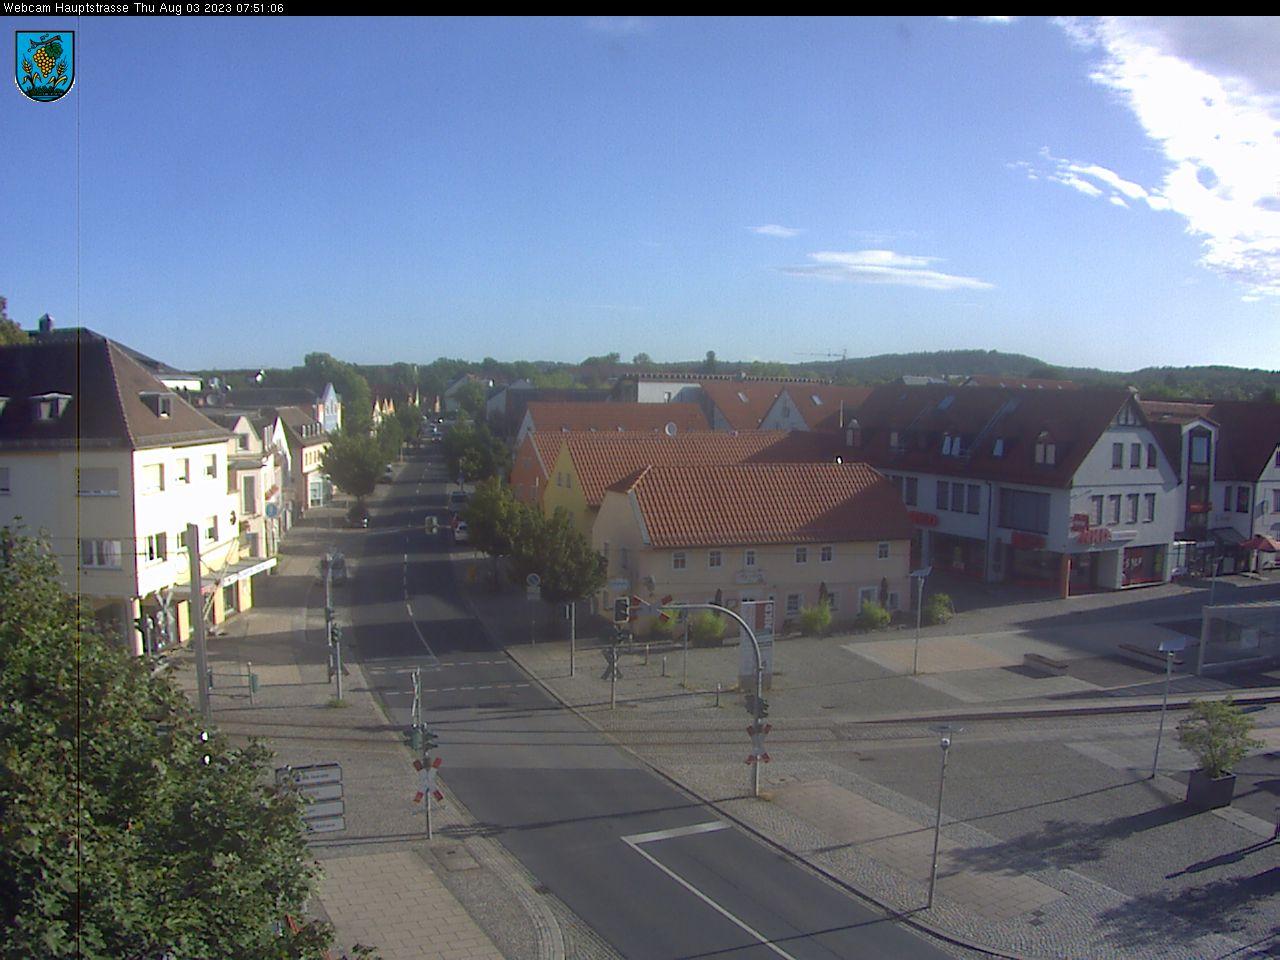 Coswig (Sassonia) Mer. 07:51